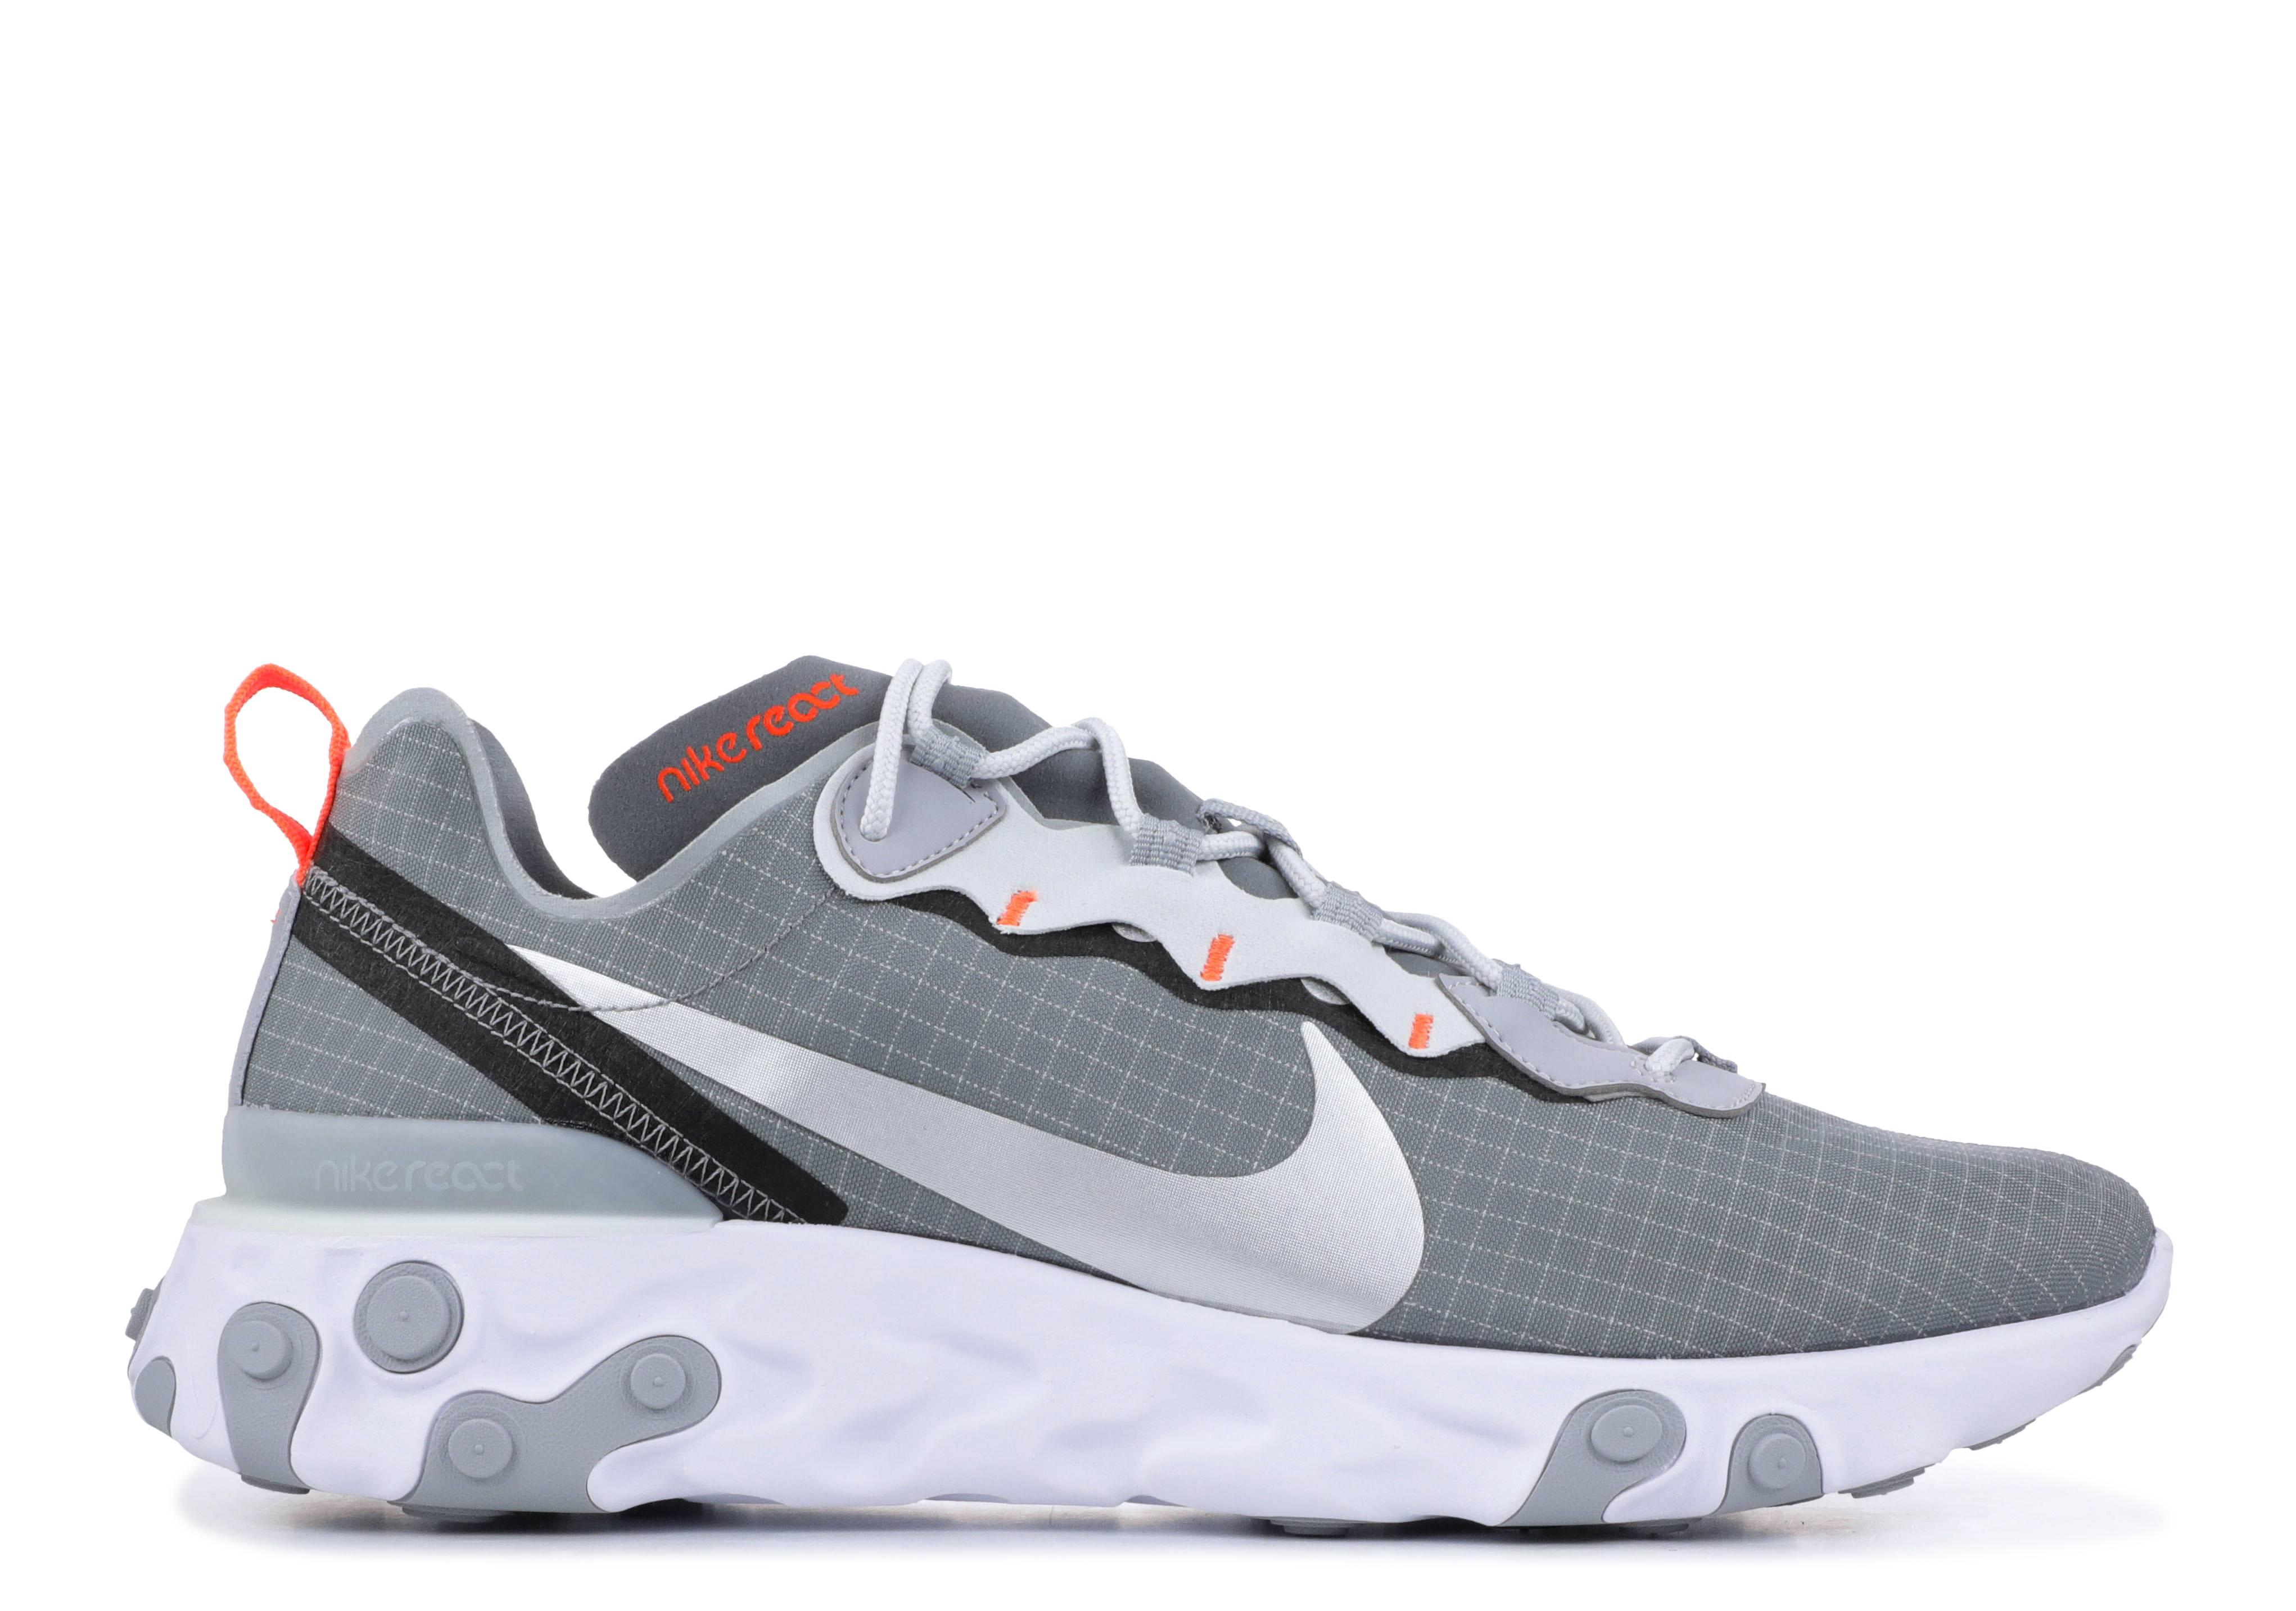 c433e96ed394 Nike React Element 55 - Nike - cd1503 001 - cool grey metallic-silver